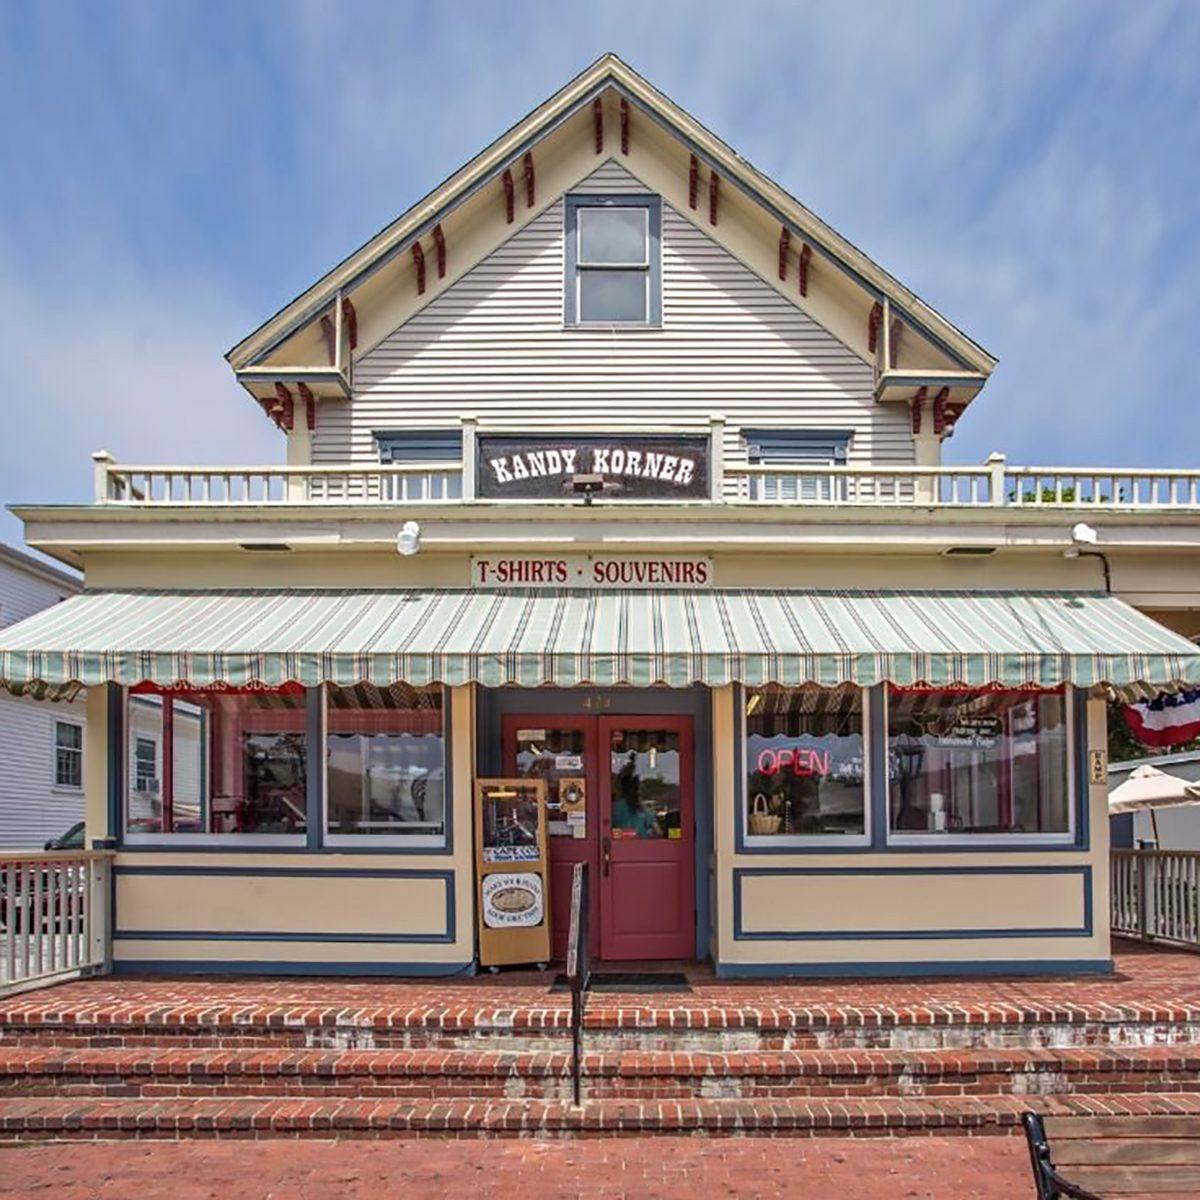 The Best Fudge Shop in Massachusetts - Kandy Korner